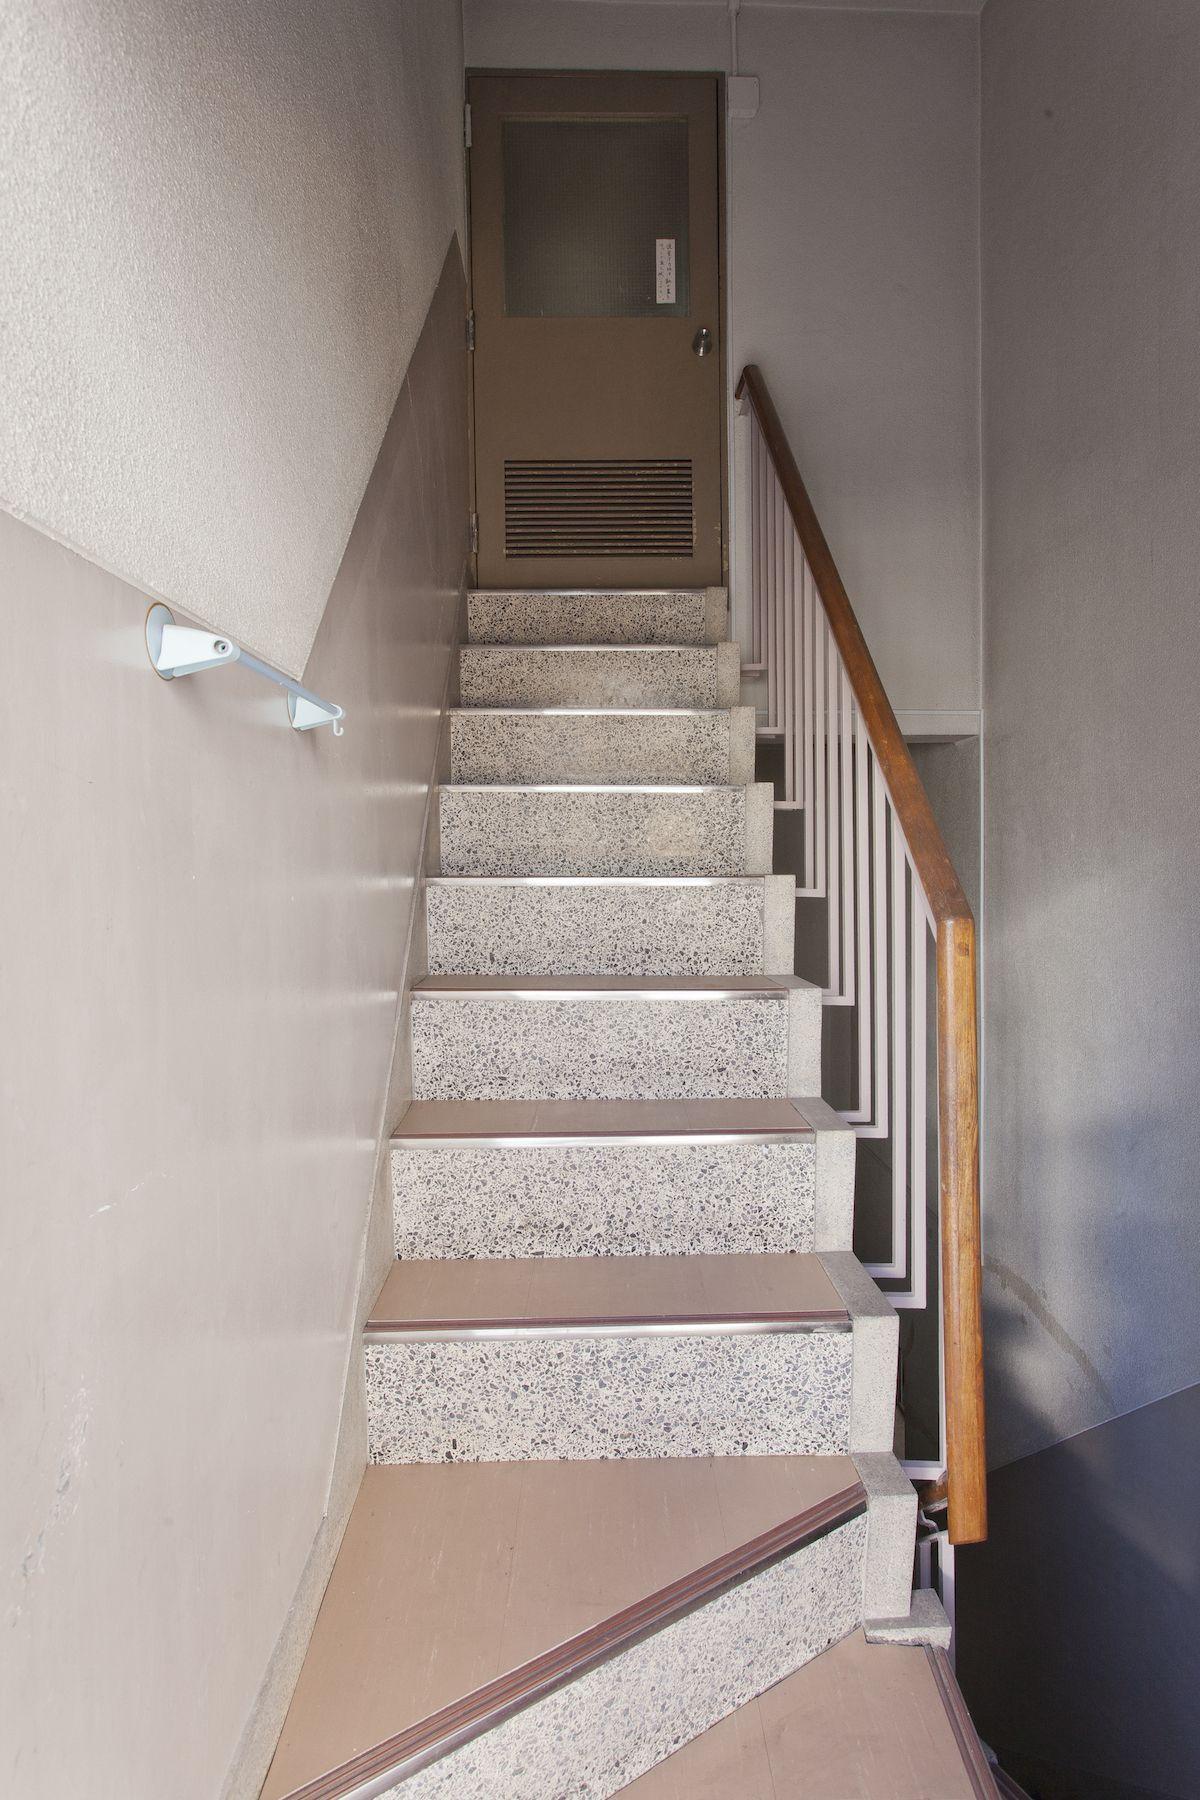 Studio EcoDeco (スタジオエコデコ)屋上階段